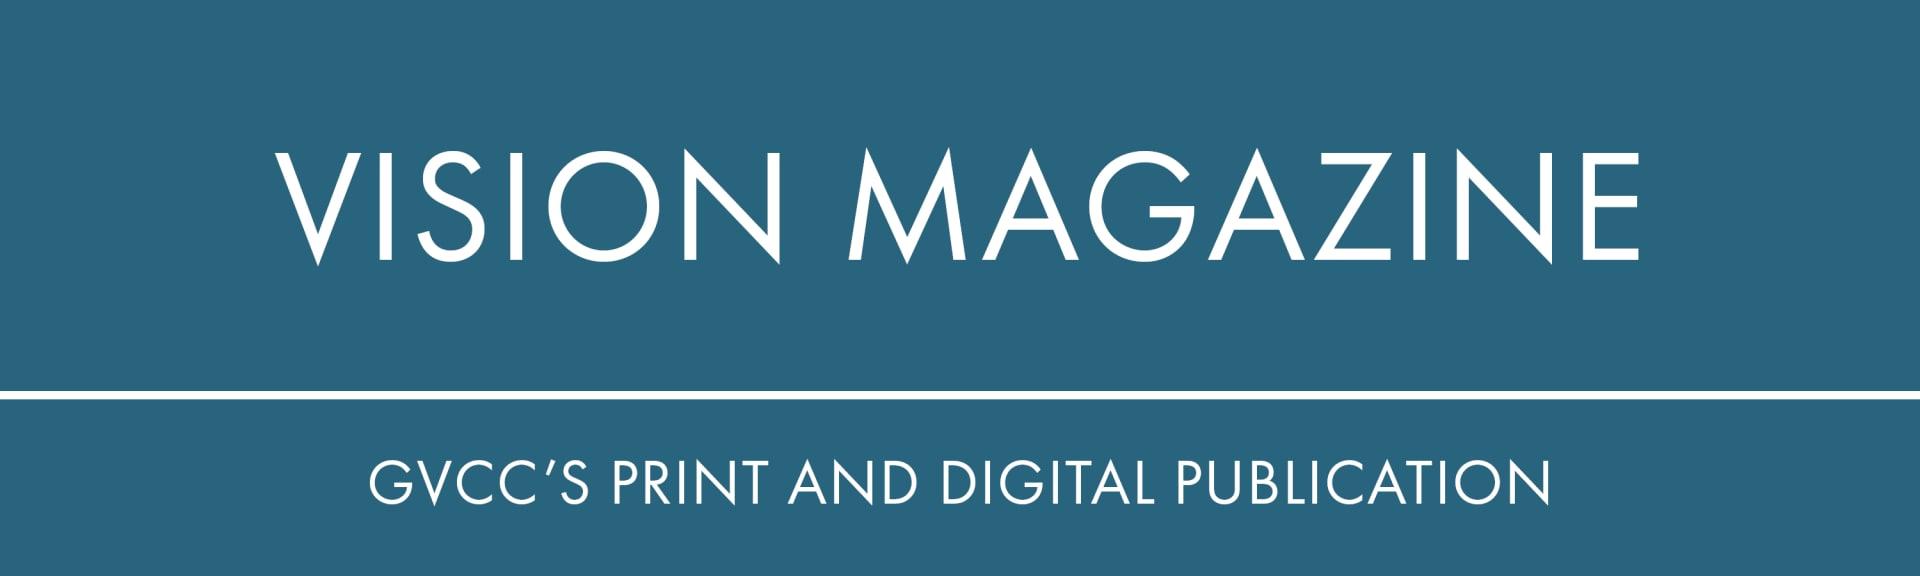 Vision Magazine Bi-monthly publication print digital Greater Vancouver Chamber of Commerce networking organization membership read Southwest Washington Business Community